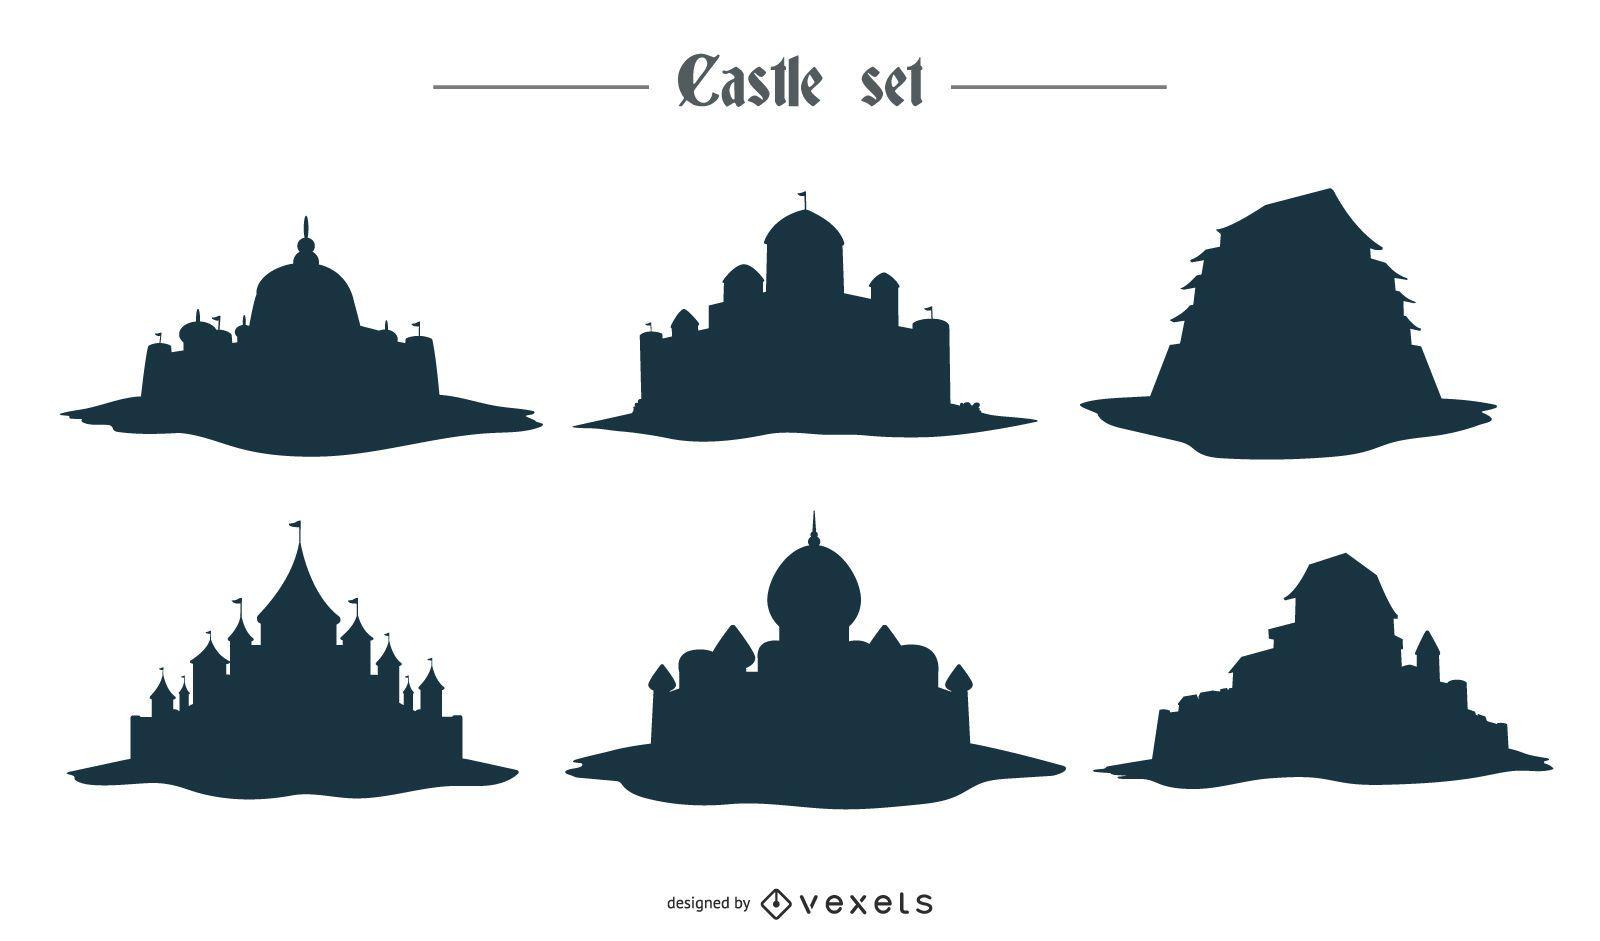 Castle silhouette vectorial designs